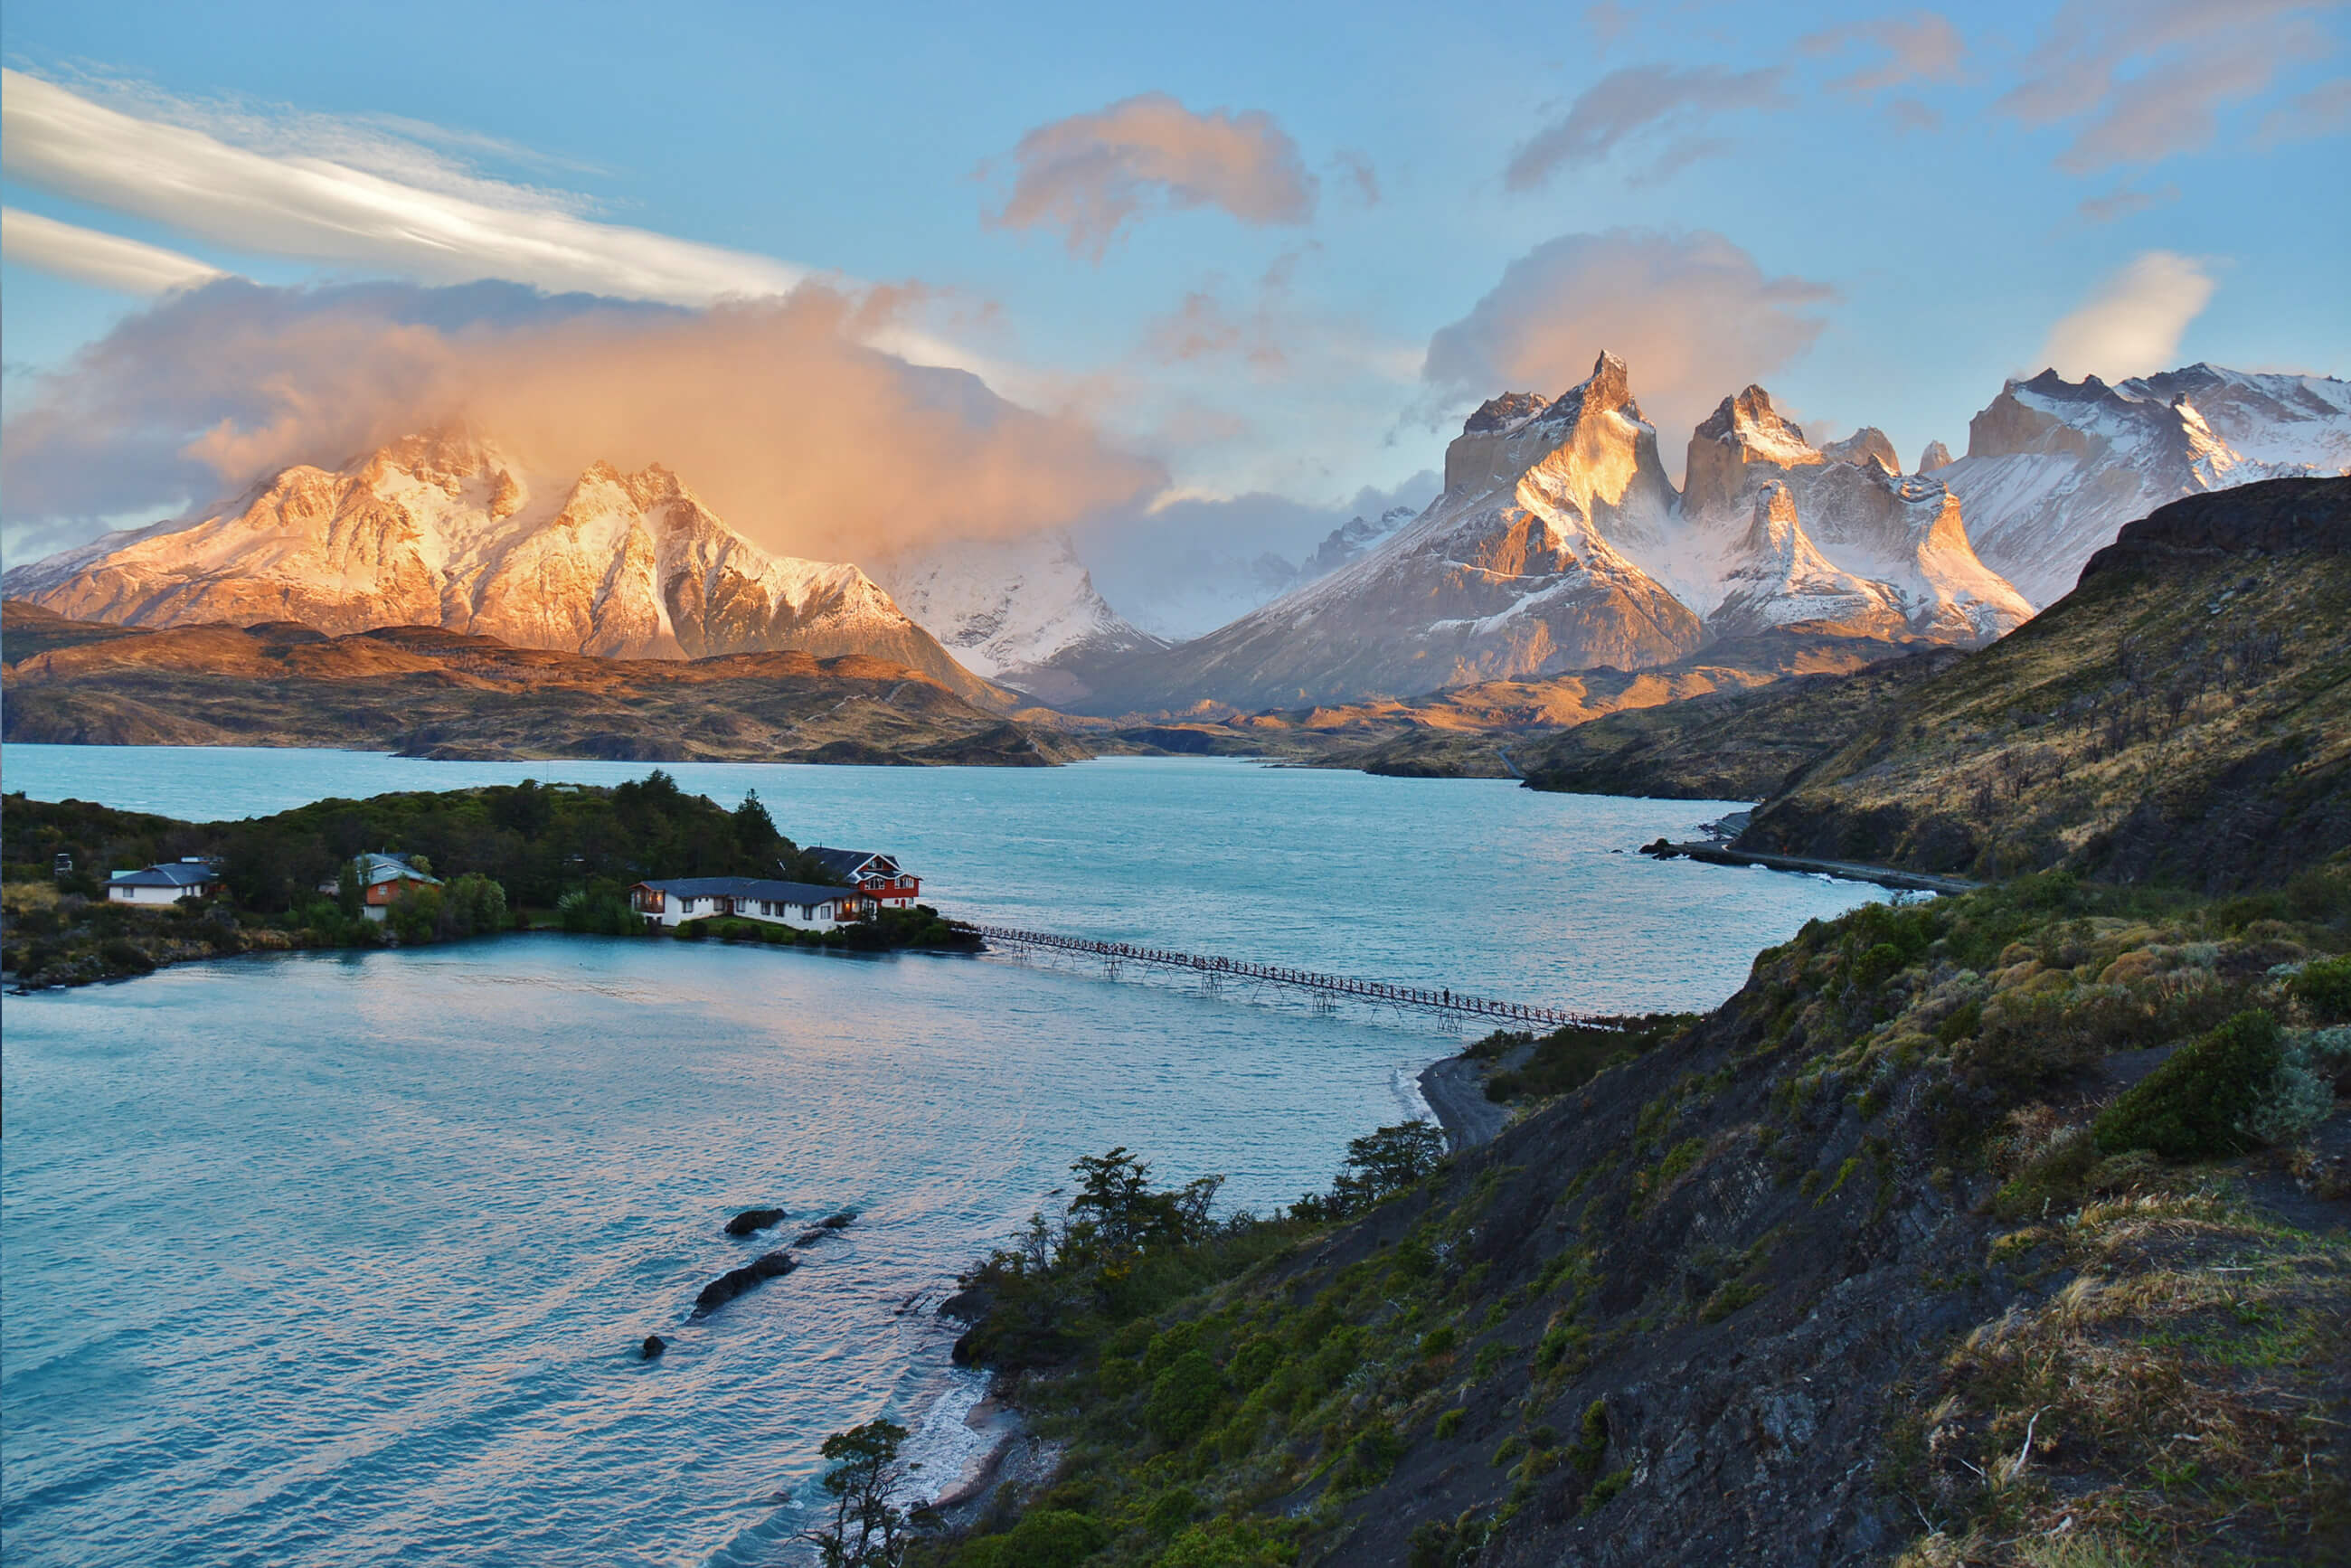 https://bubo.sk/uploads/galleries/5016/patagonia-chile-mirka-sulka-89-.jpg